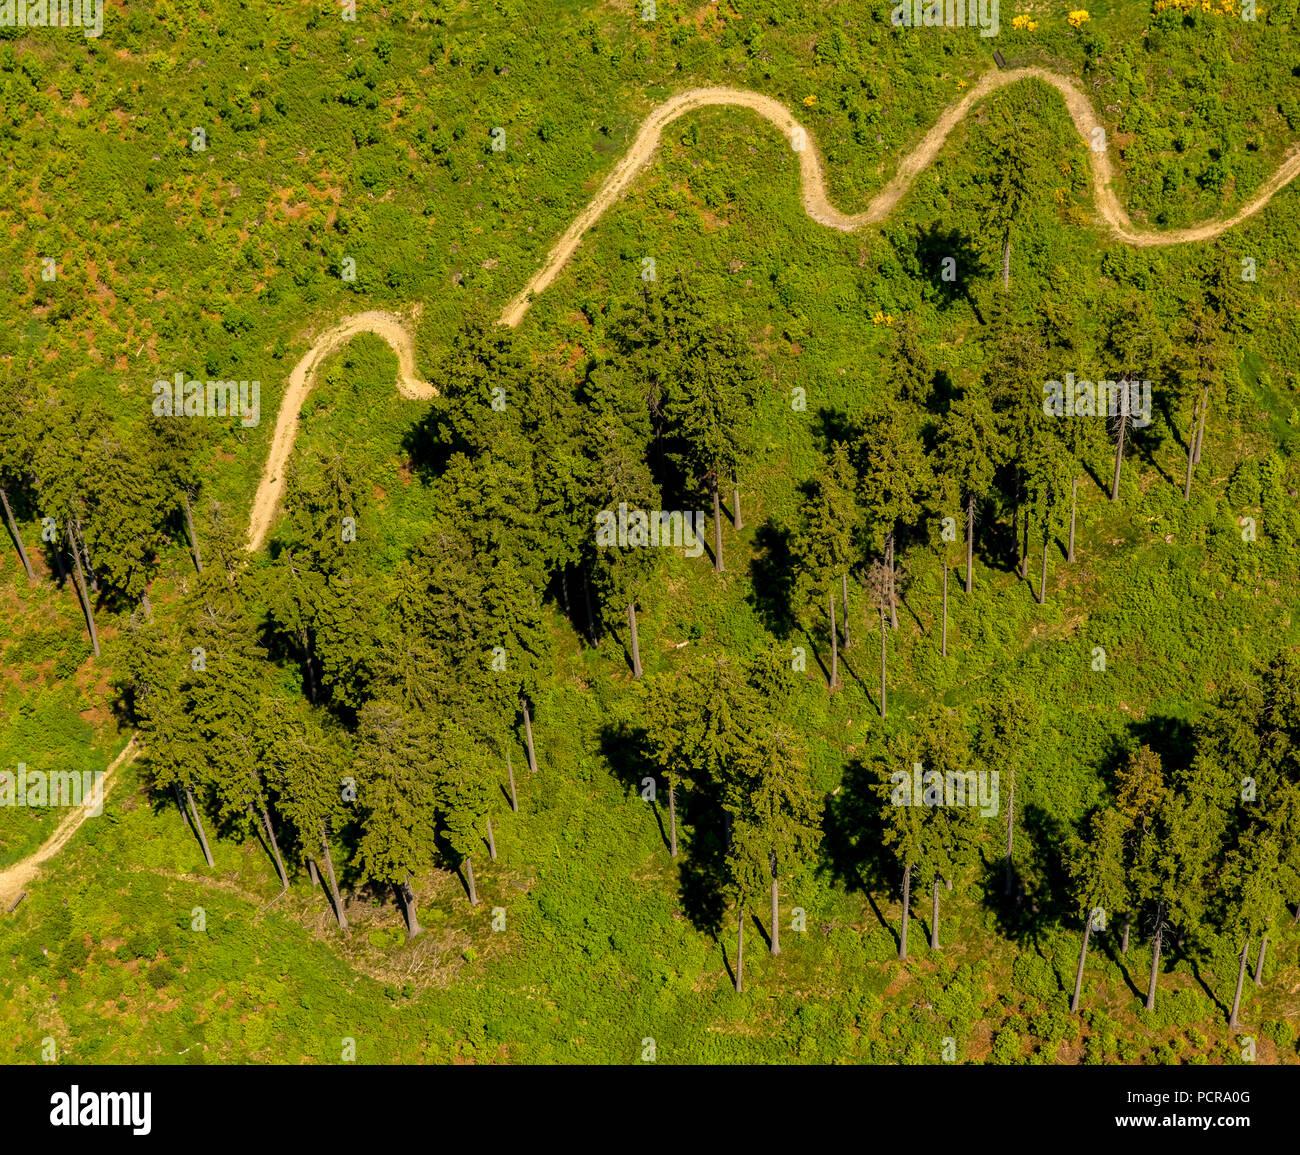 winding path, meadow, conifers, spruce, looped mountain path at the Hochheidehütte in Niedersfeld, Rothaar Mountains, Winterberg, Hochsauerland, North Rhine-Westphalia, Germany - Stock Image